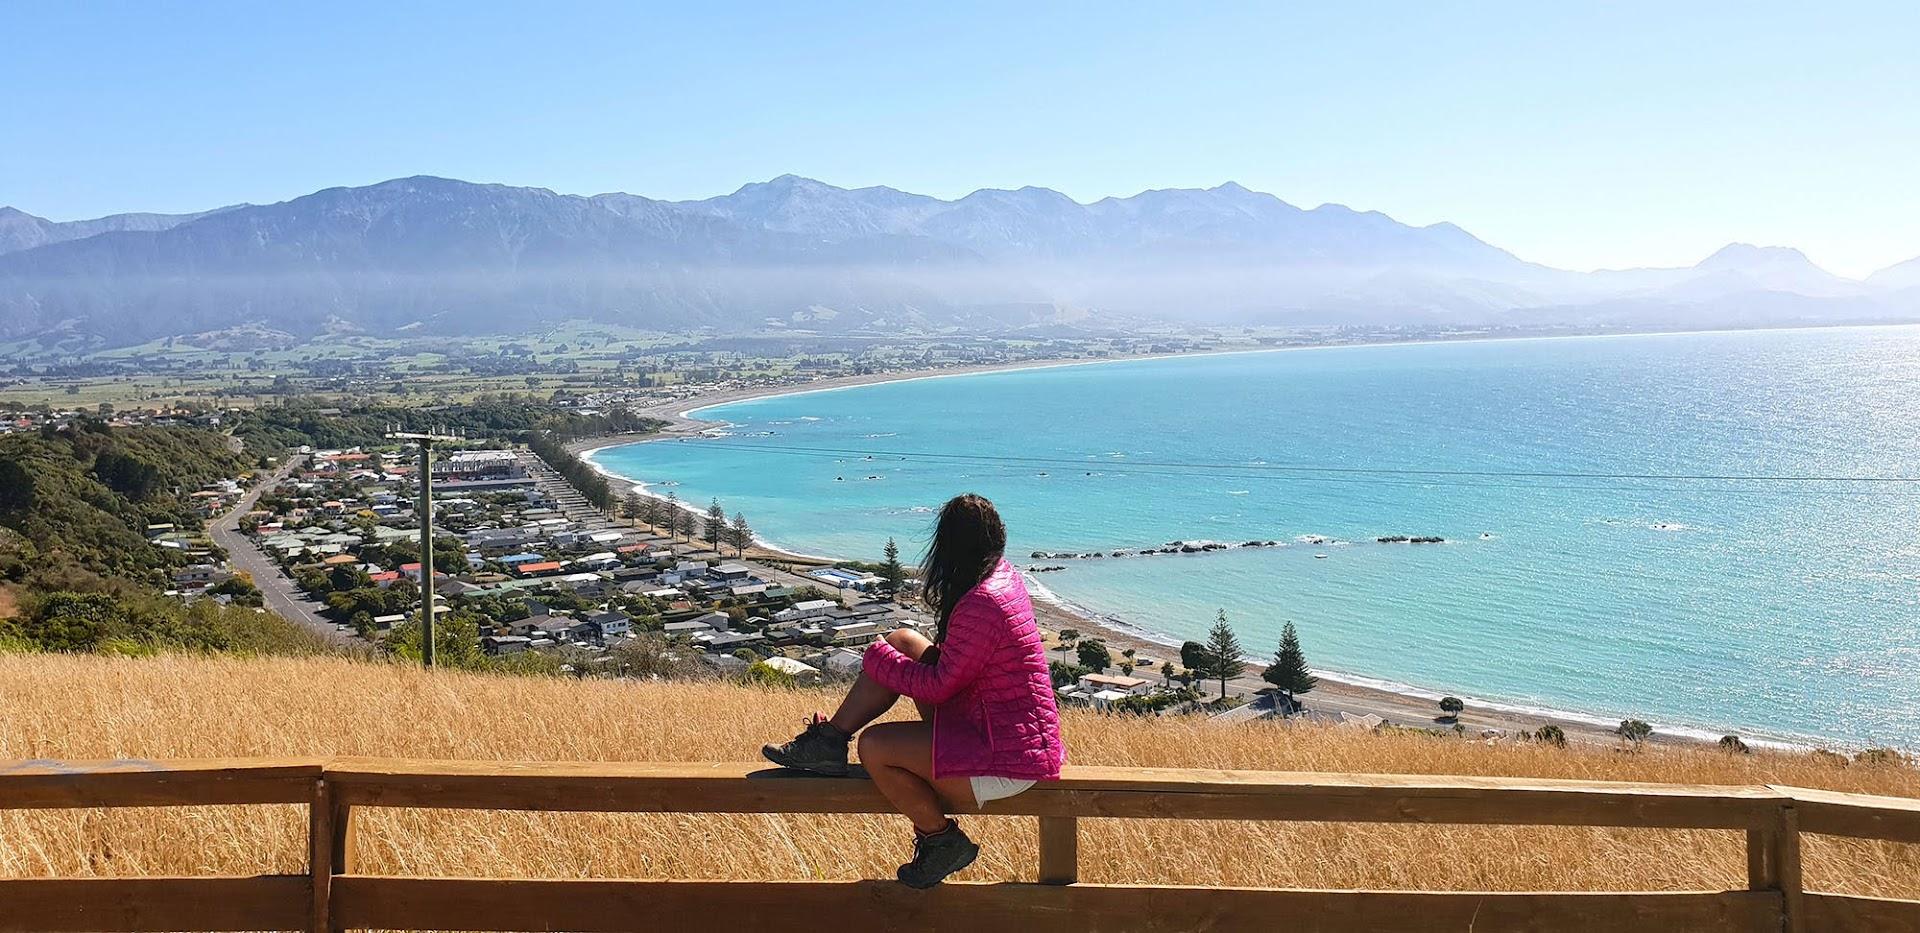 Viajar na Nova Zelândia